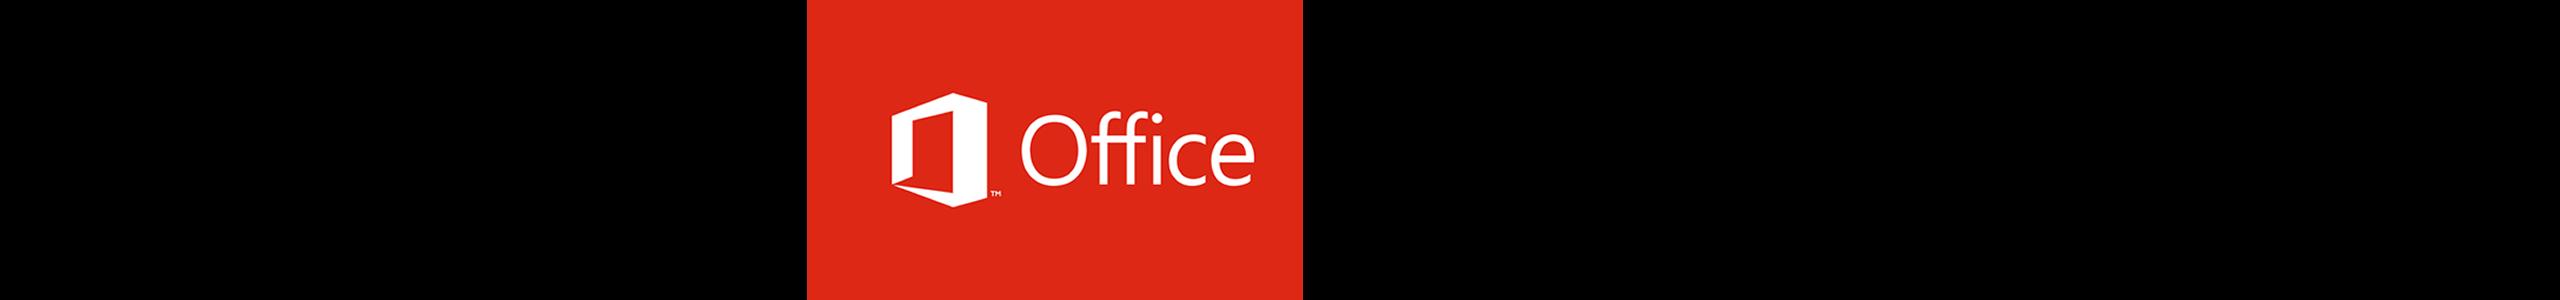 Webinar: Microsoft Office 2013